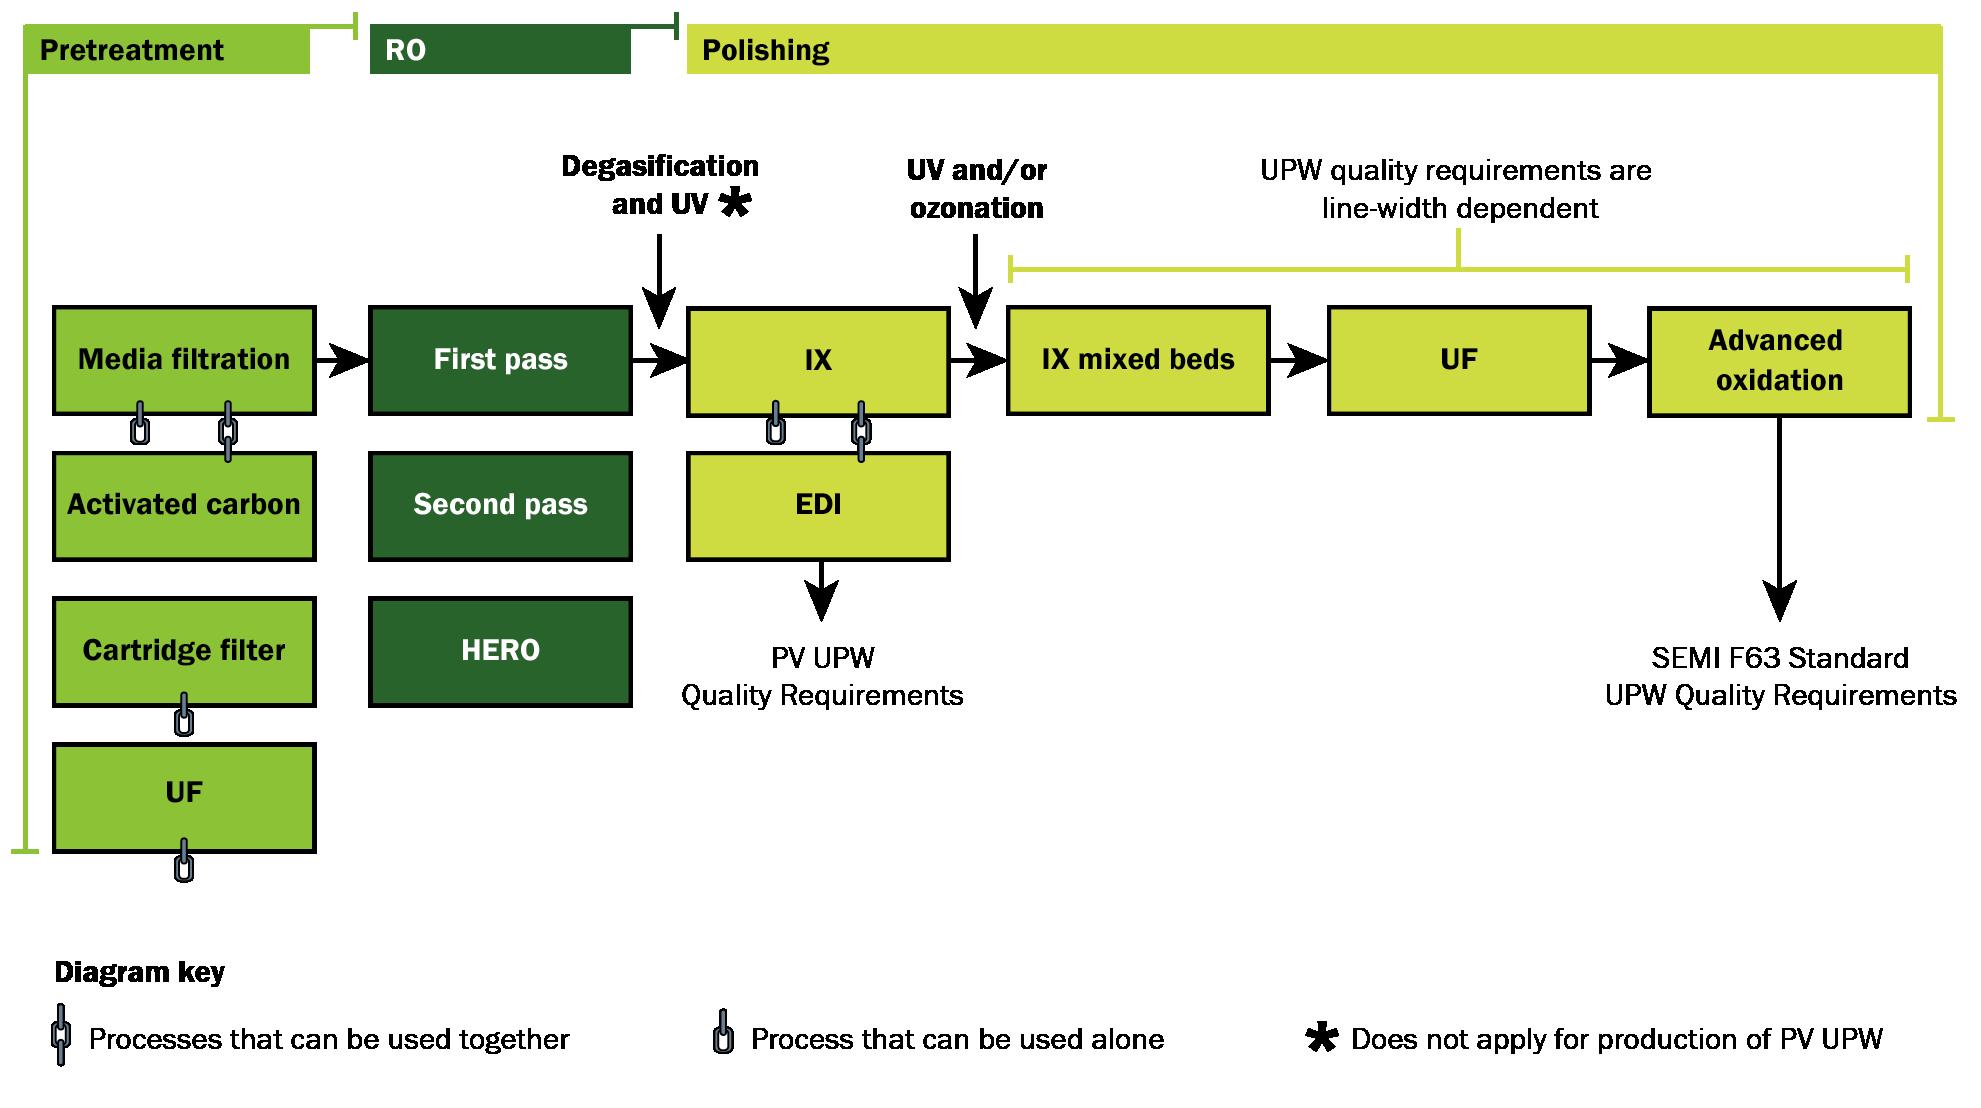 Microelectronics ultrap fmt